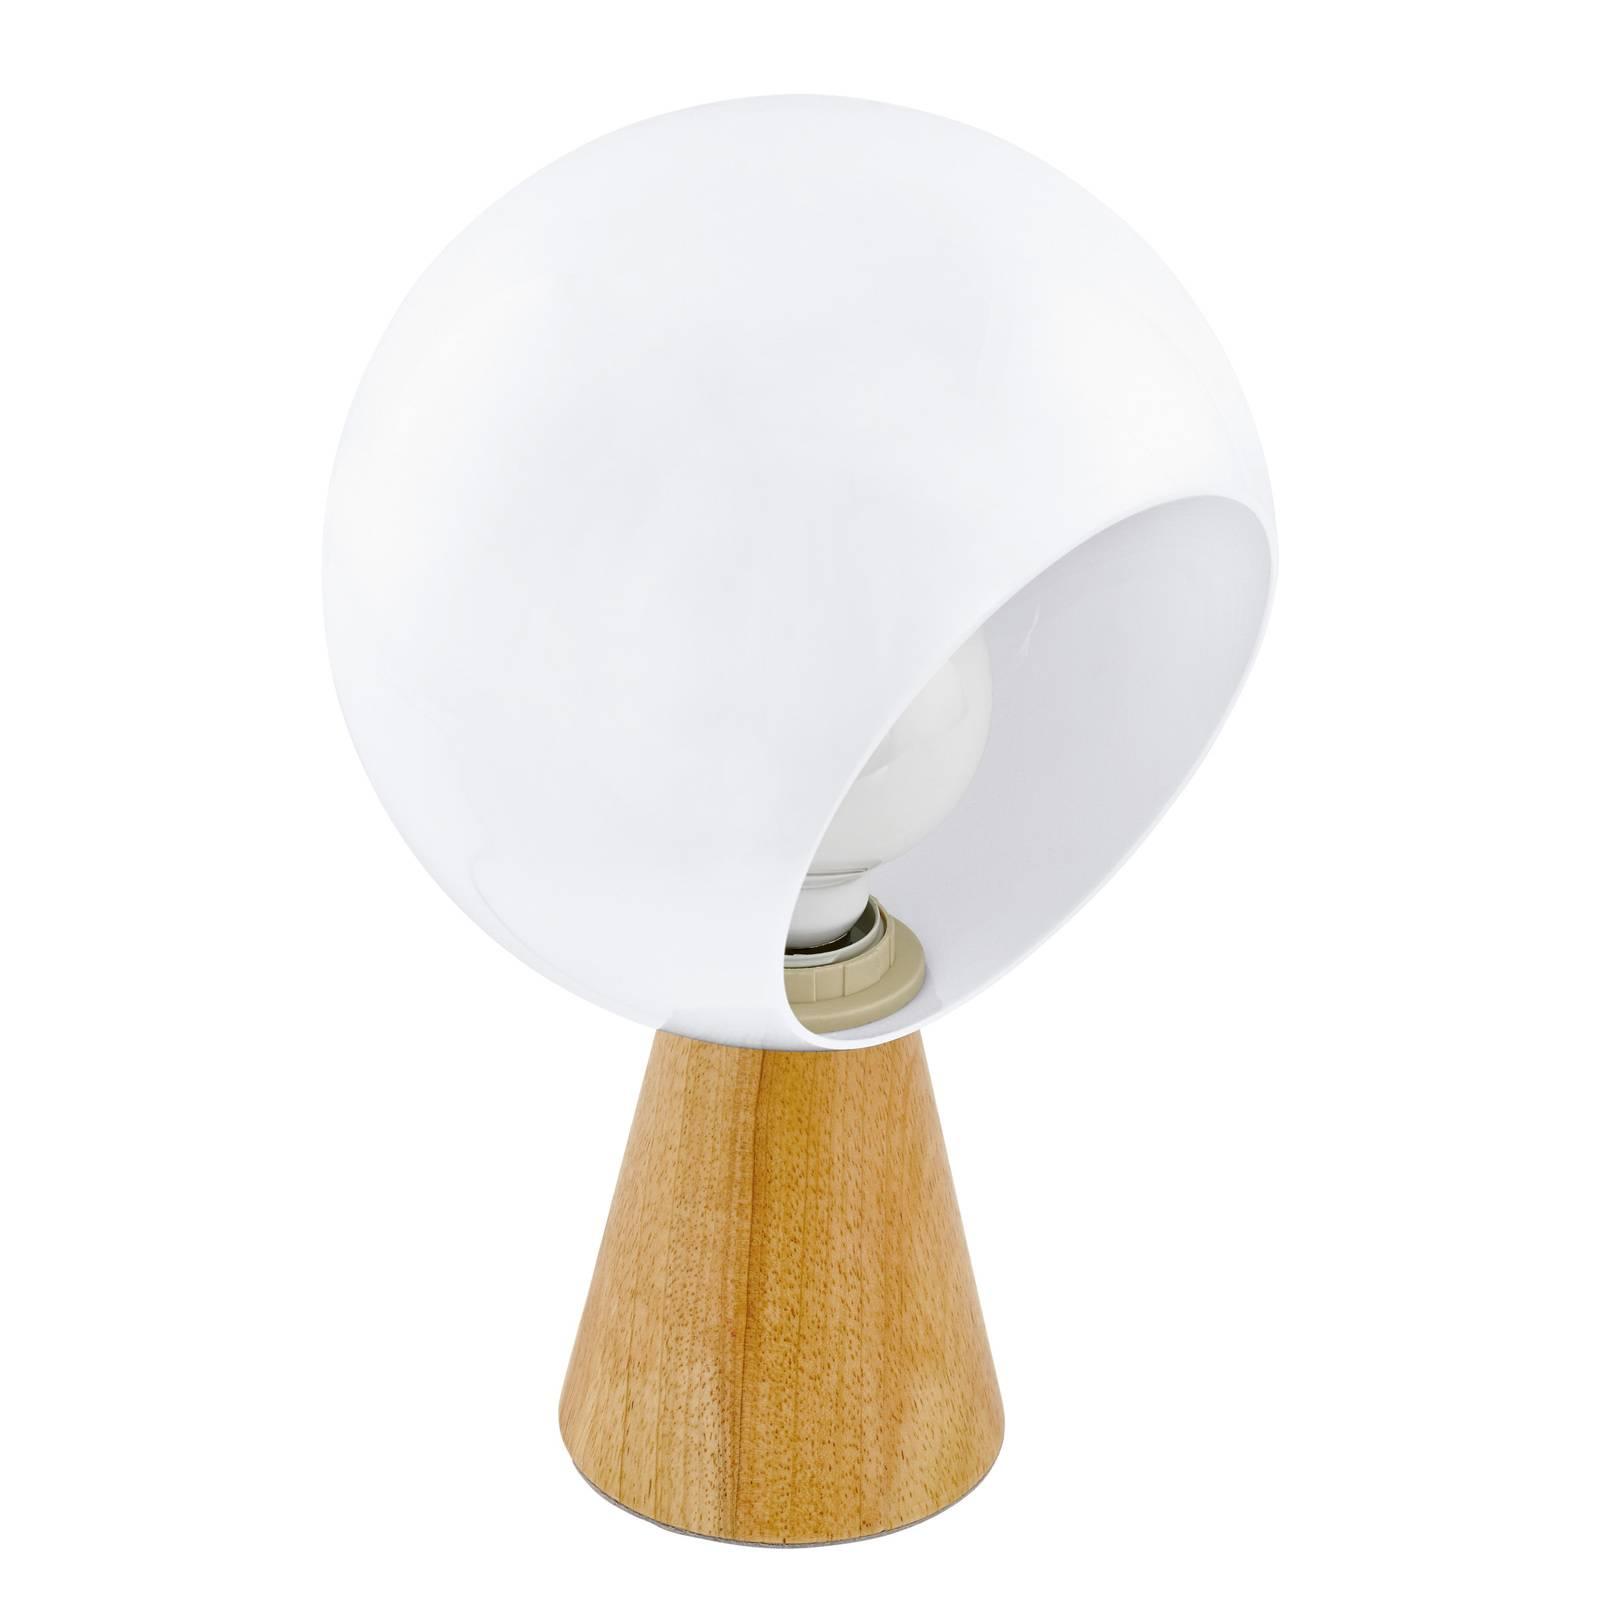 Tafellamp Mamblas met houten voet en bolkap